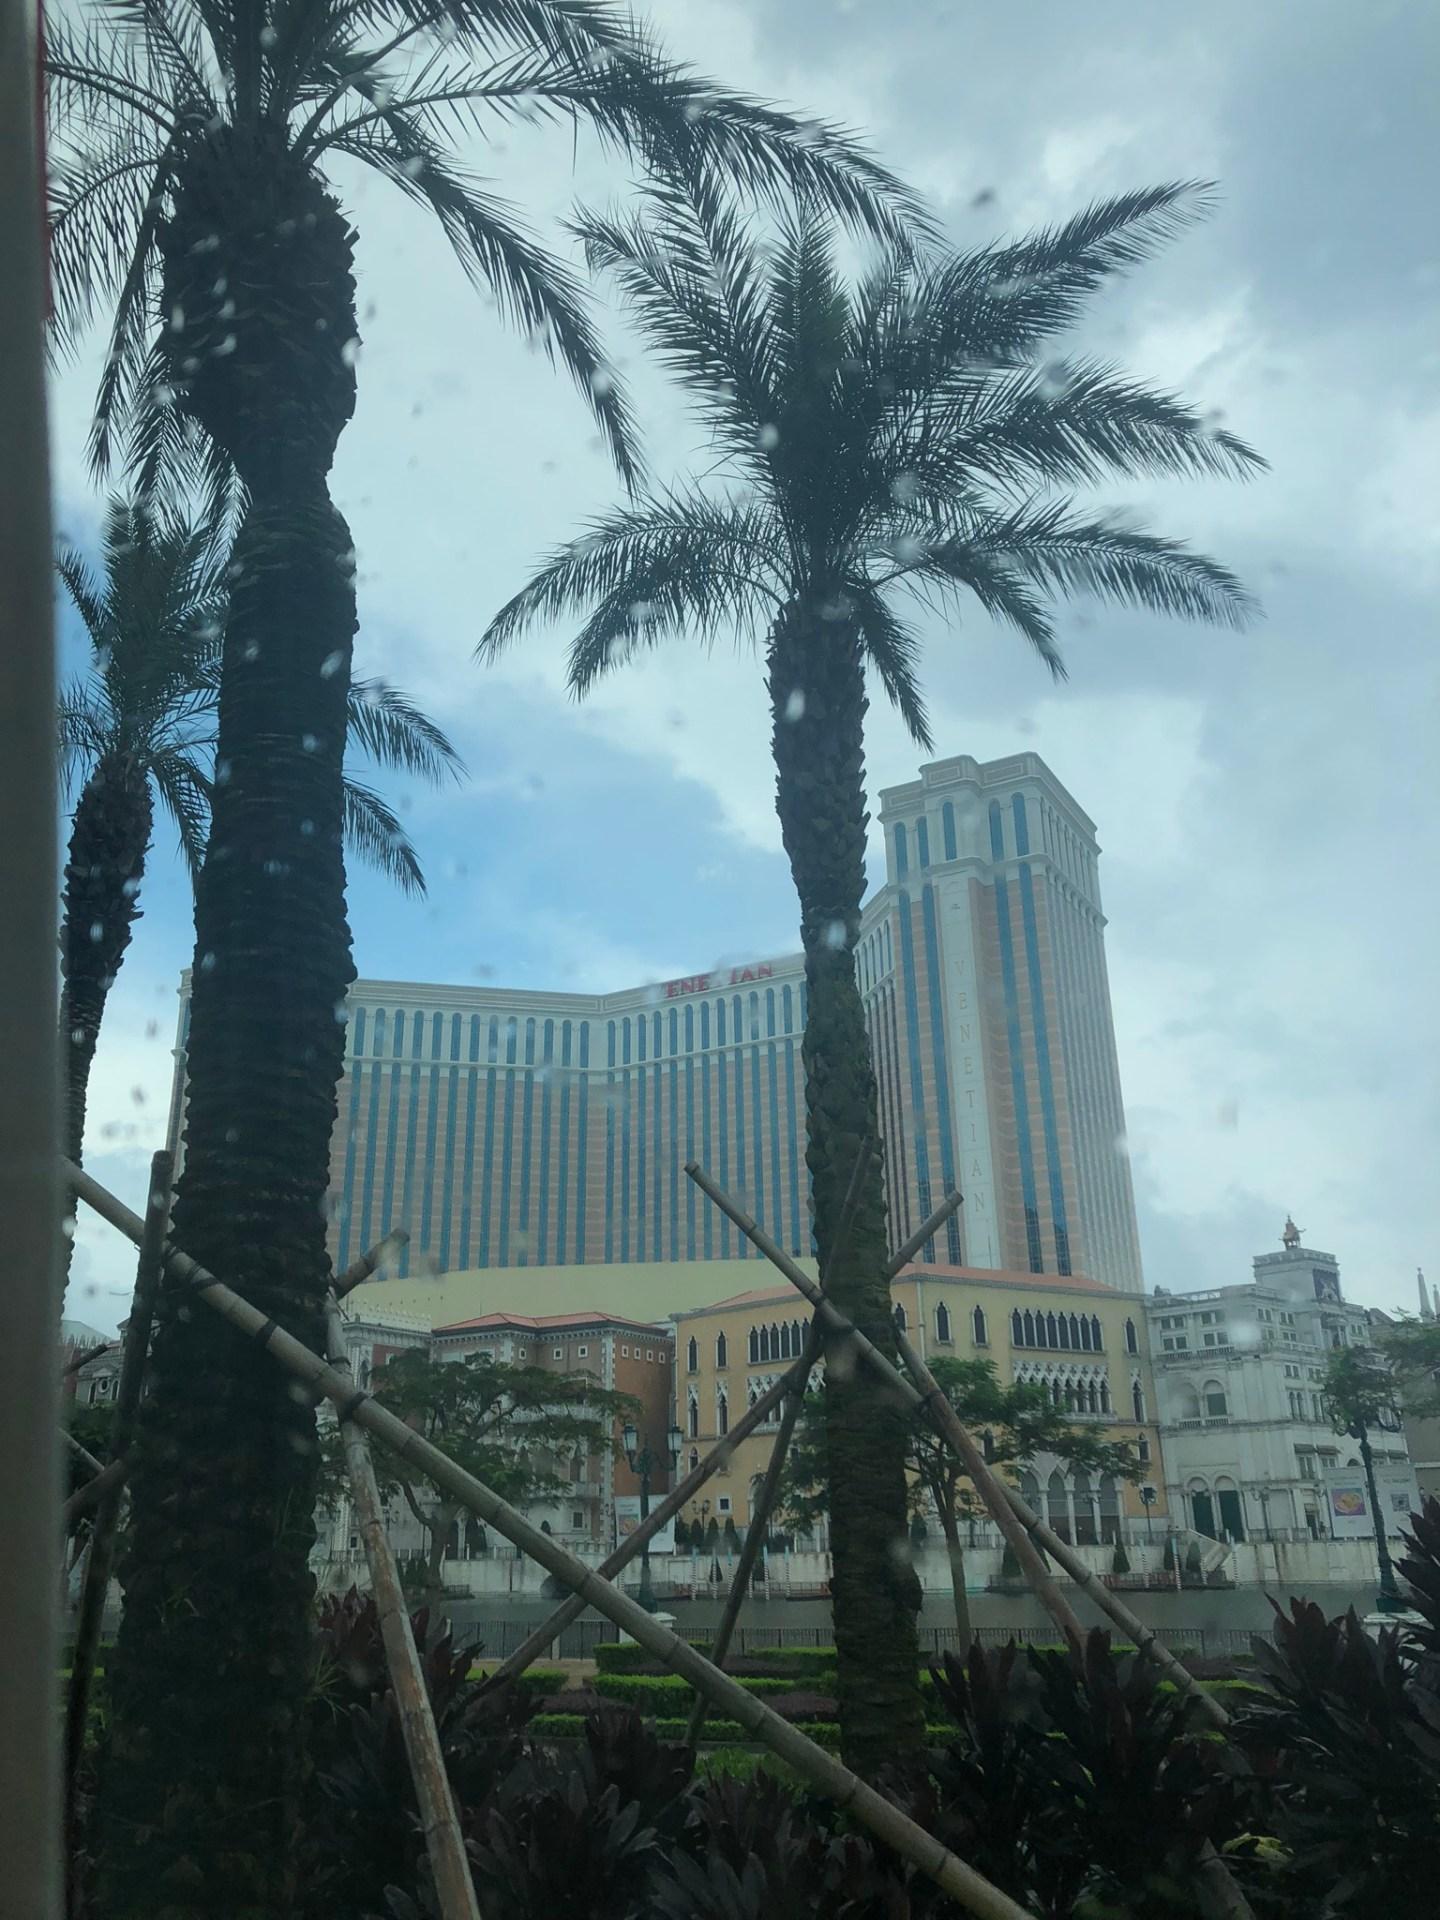 The Venetian Macau on the Cotai Strip